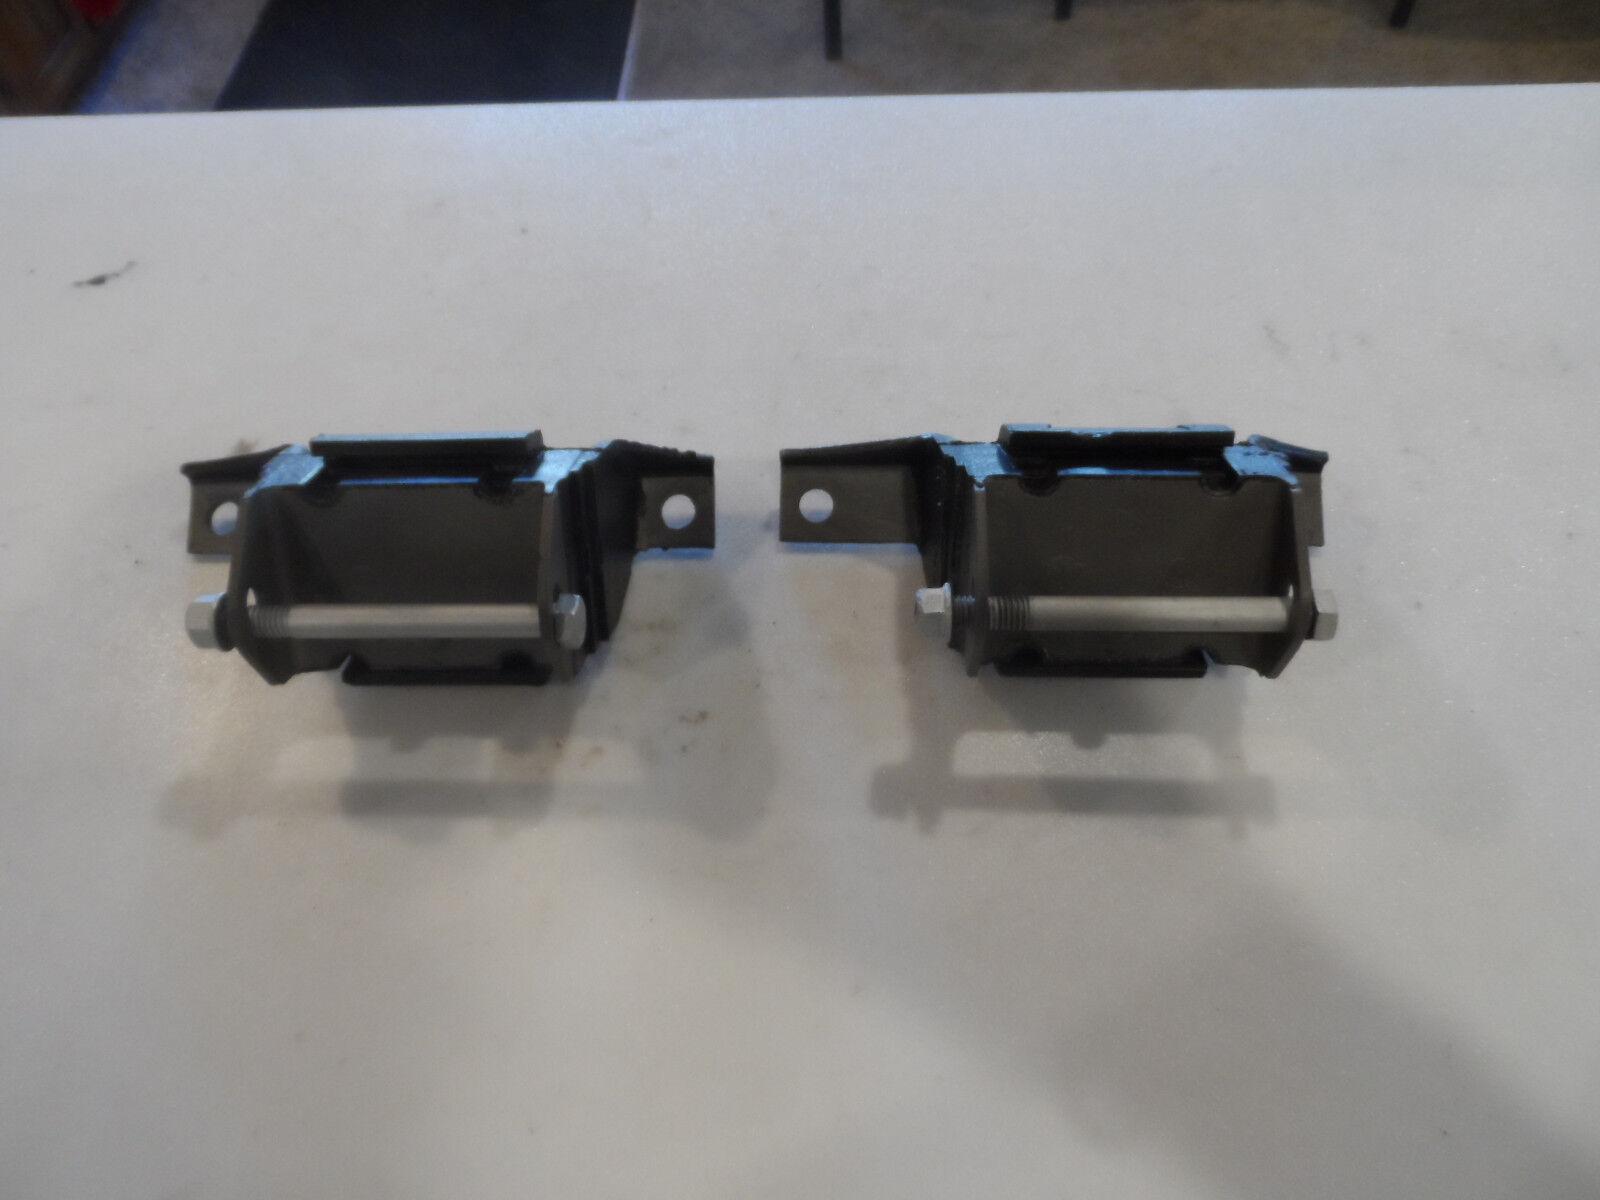 71 72 73  Mustang Cougar motor mount engine bracket insulator D1ZA-6038-BB pair